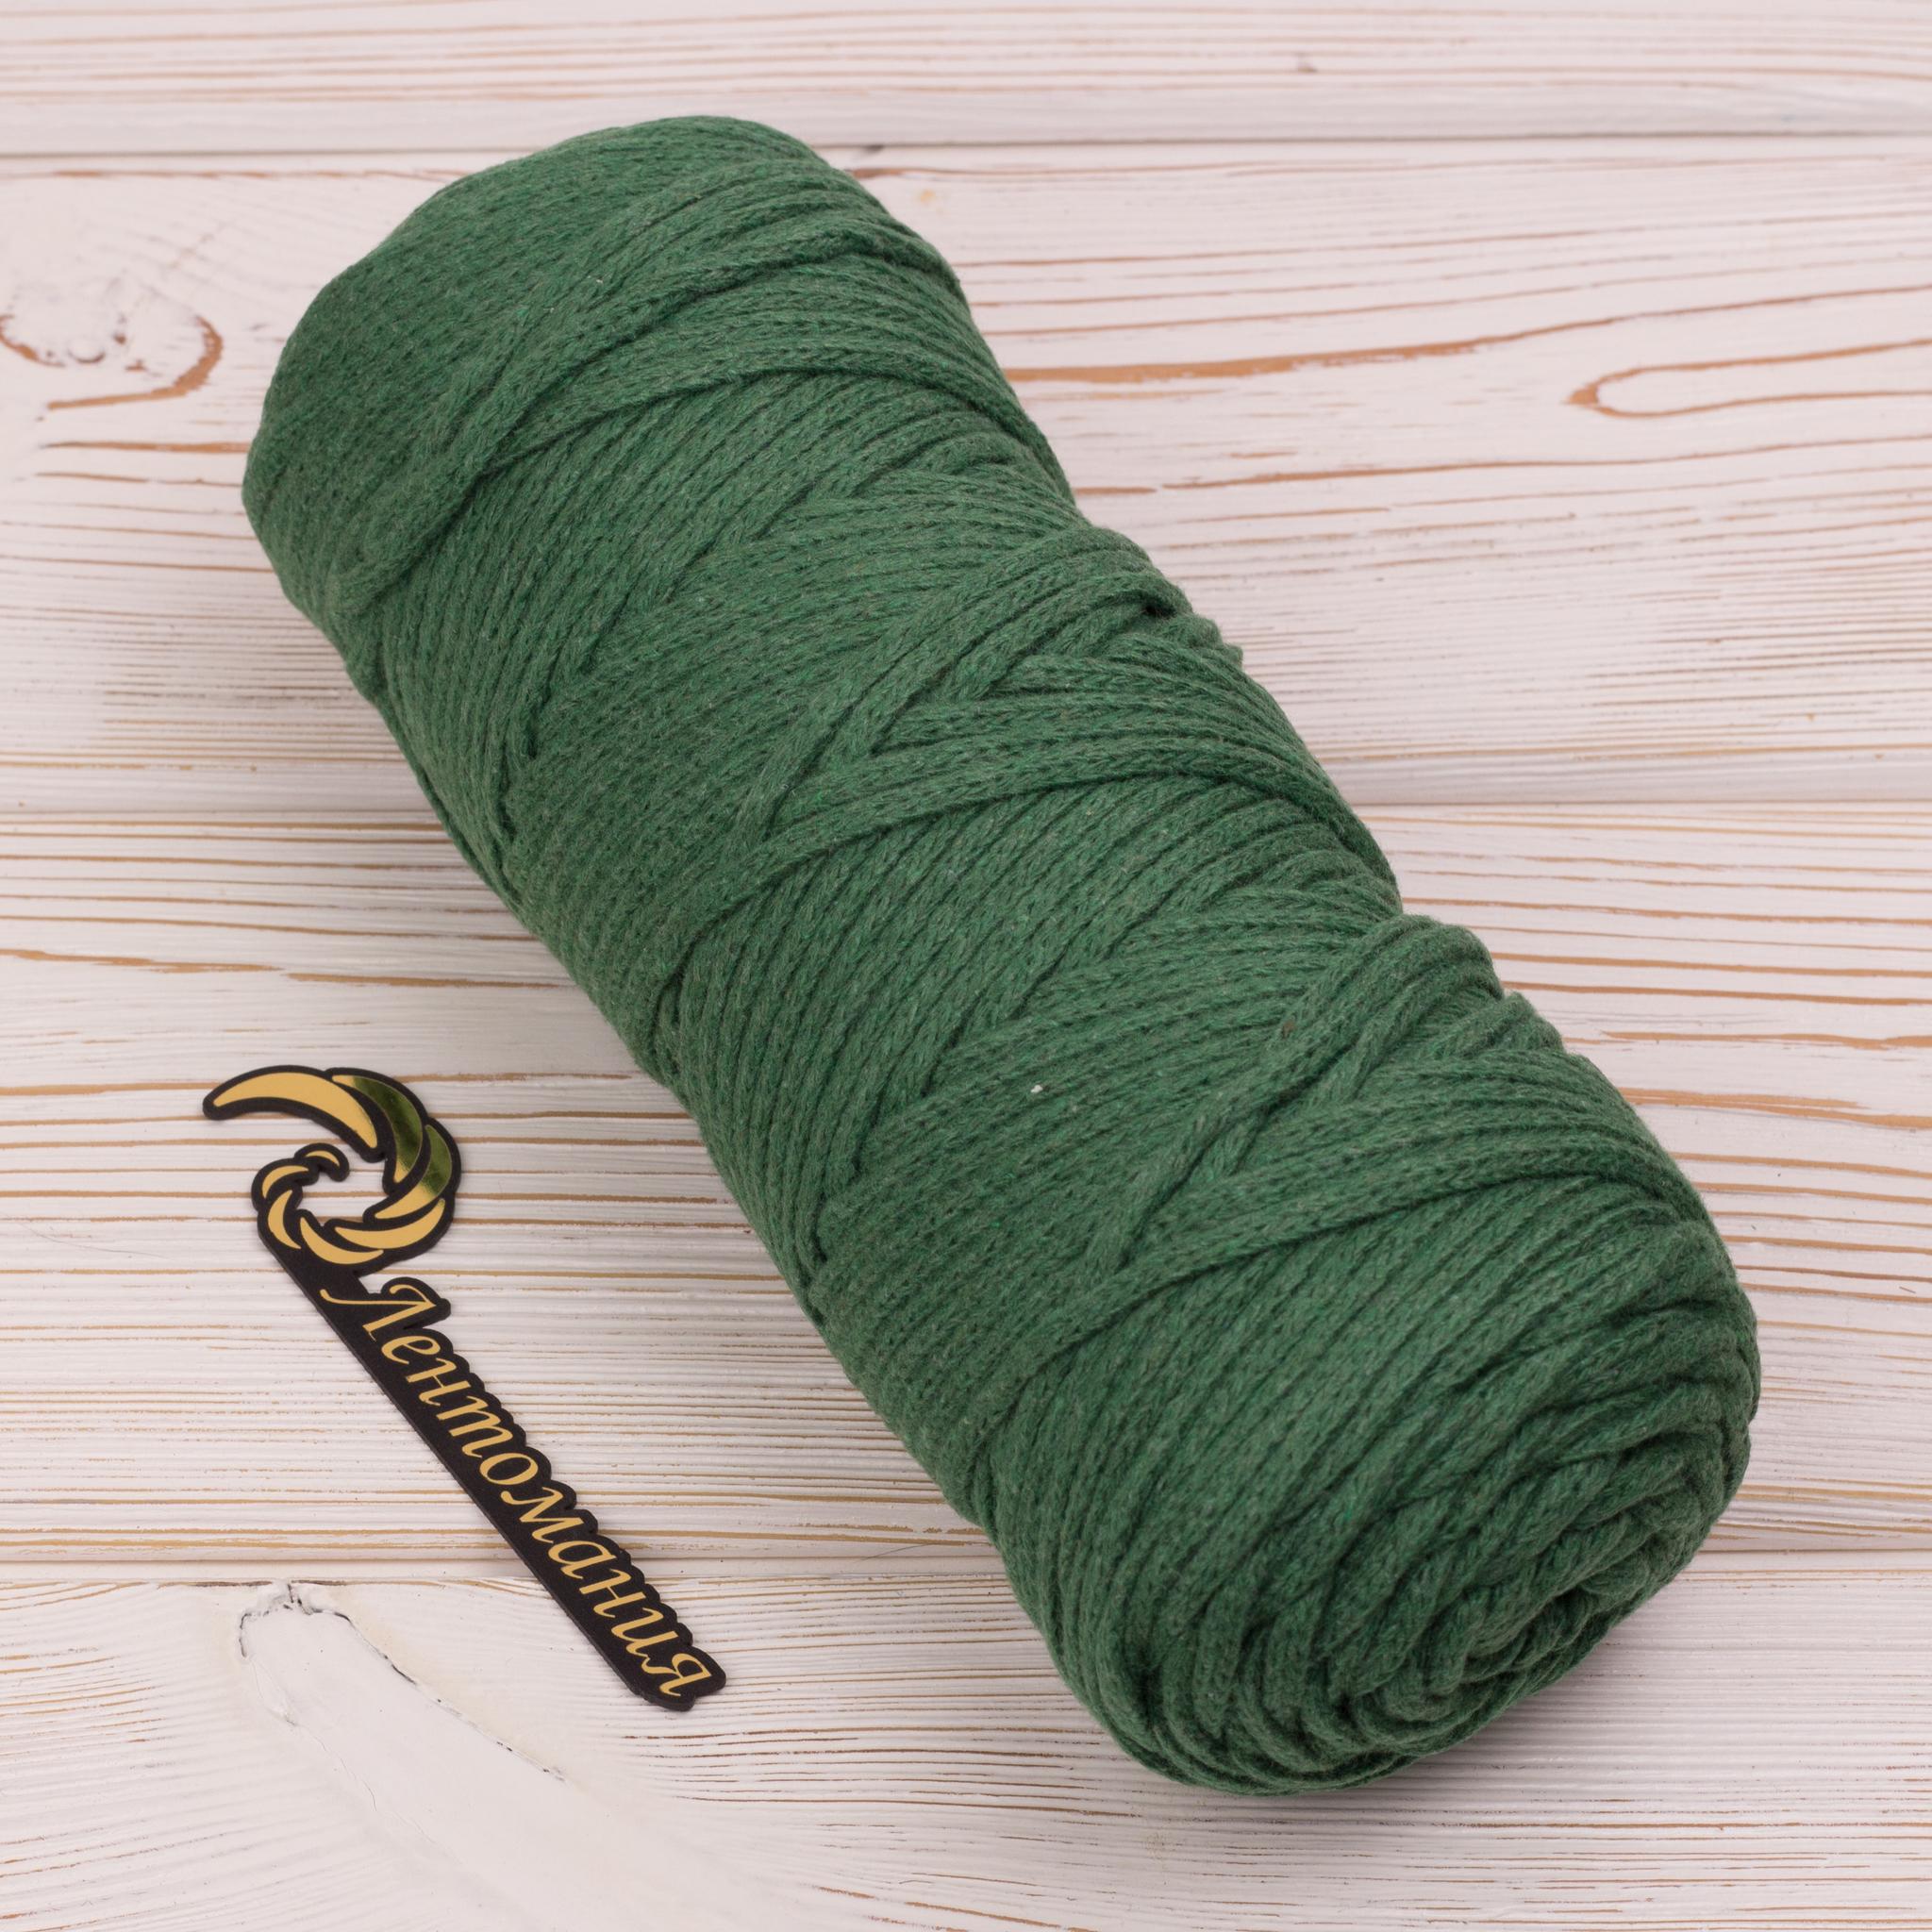 4мм Шнур 4мм Темно-зеленый IMG_4136.JPG